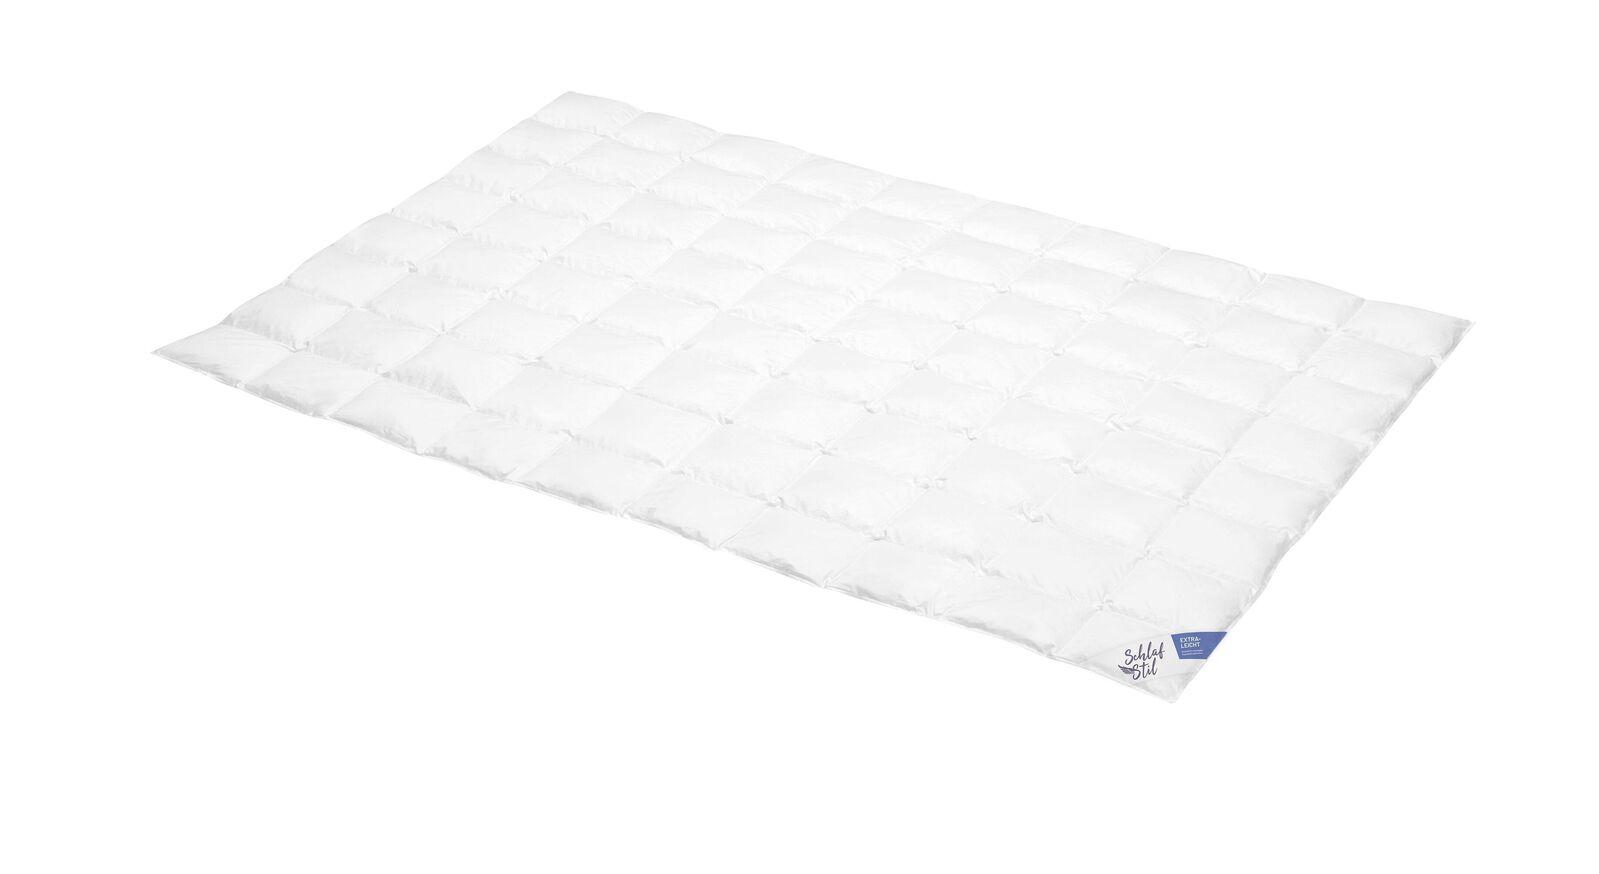 SCHLAFSTIL Daunen-Bettdecke D500 extra leicht mit Baumwollbezug